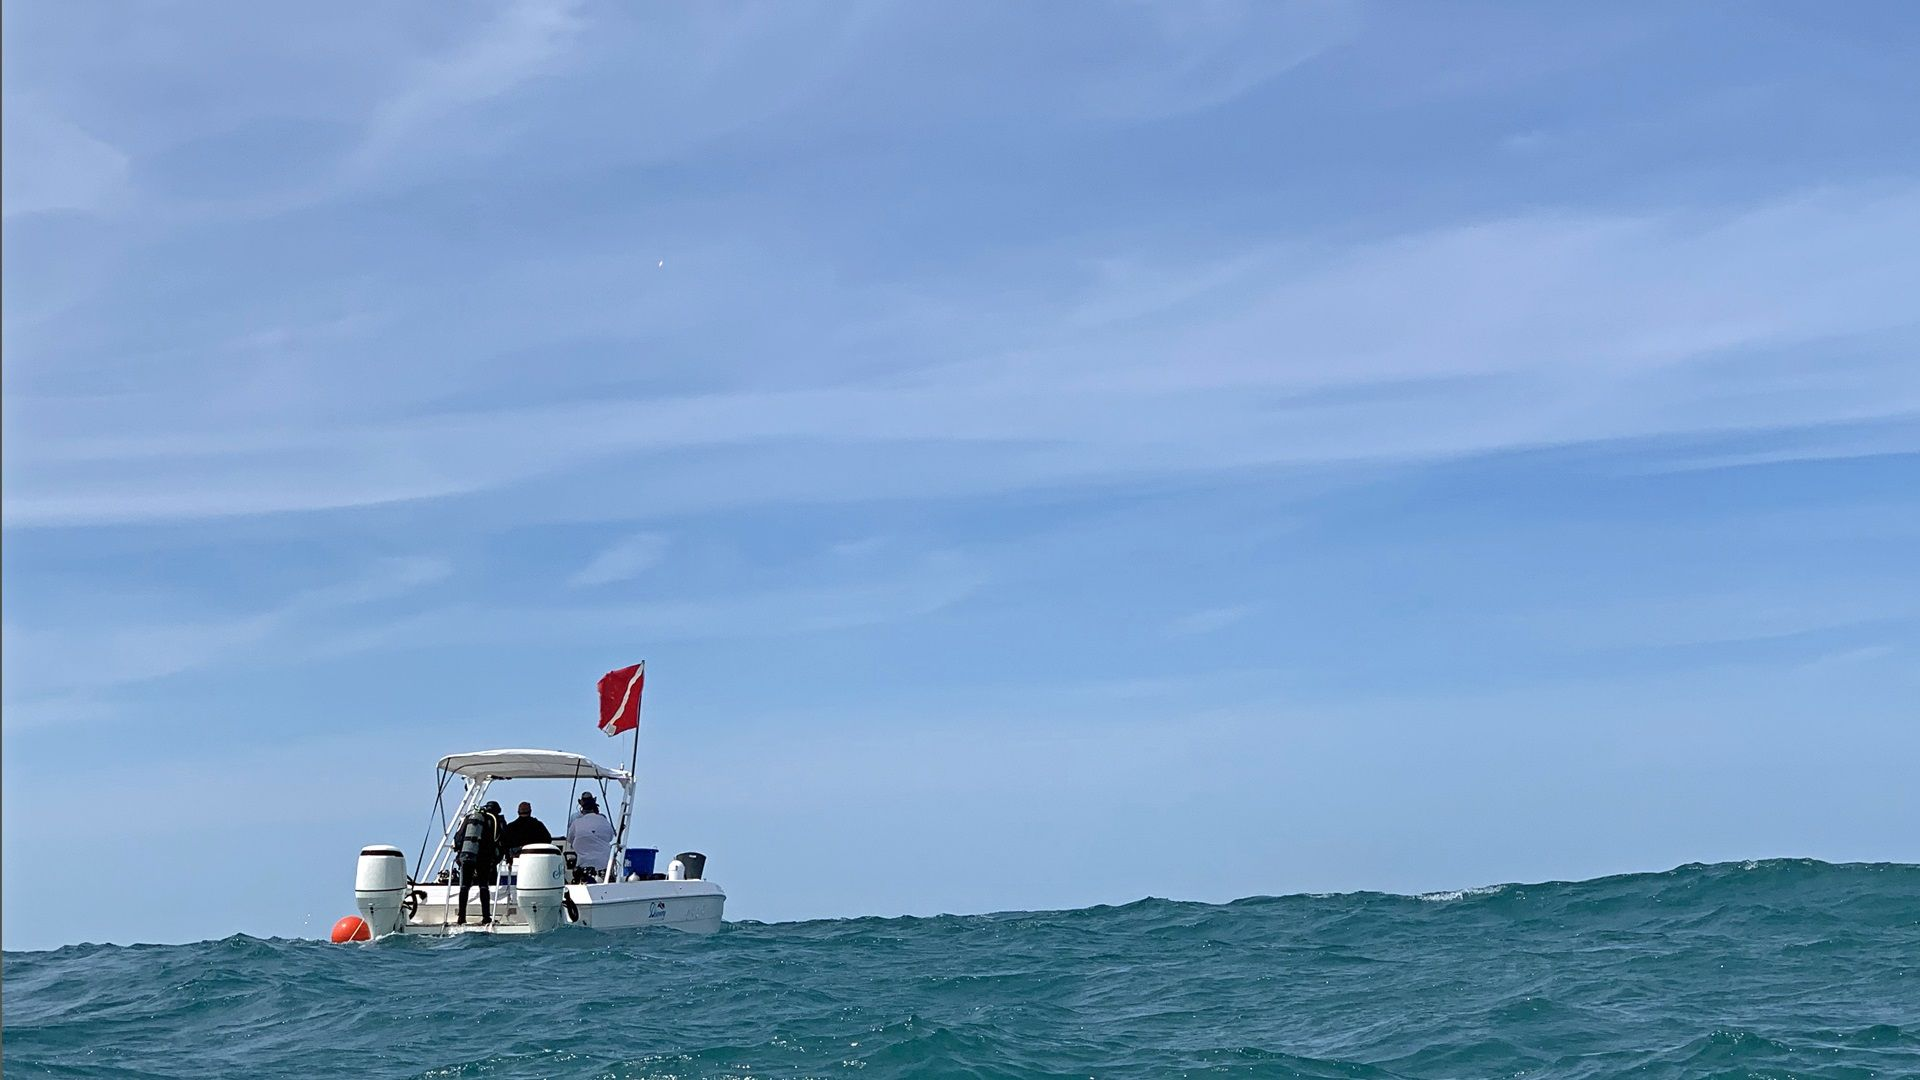 Seafarer-Exploration-SeaSearcher-Discovery-Good-Fortune-2